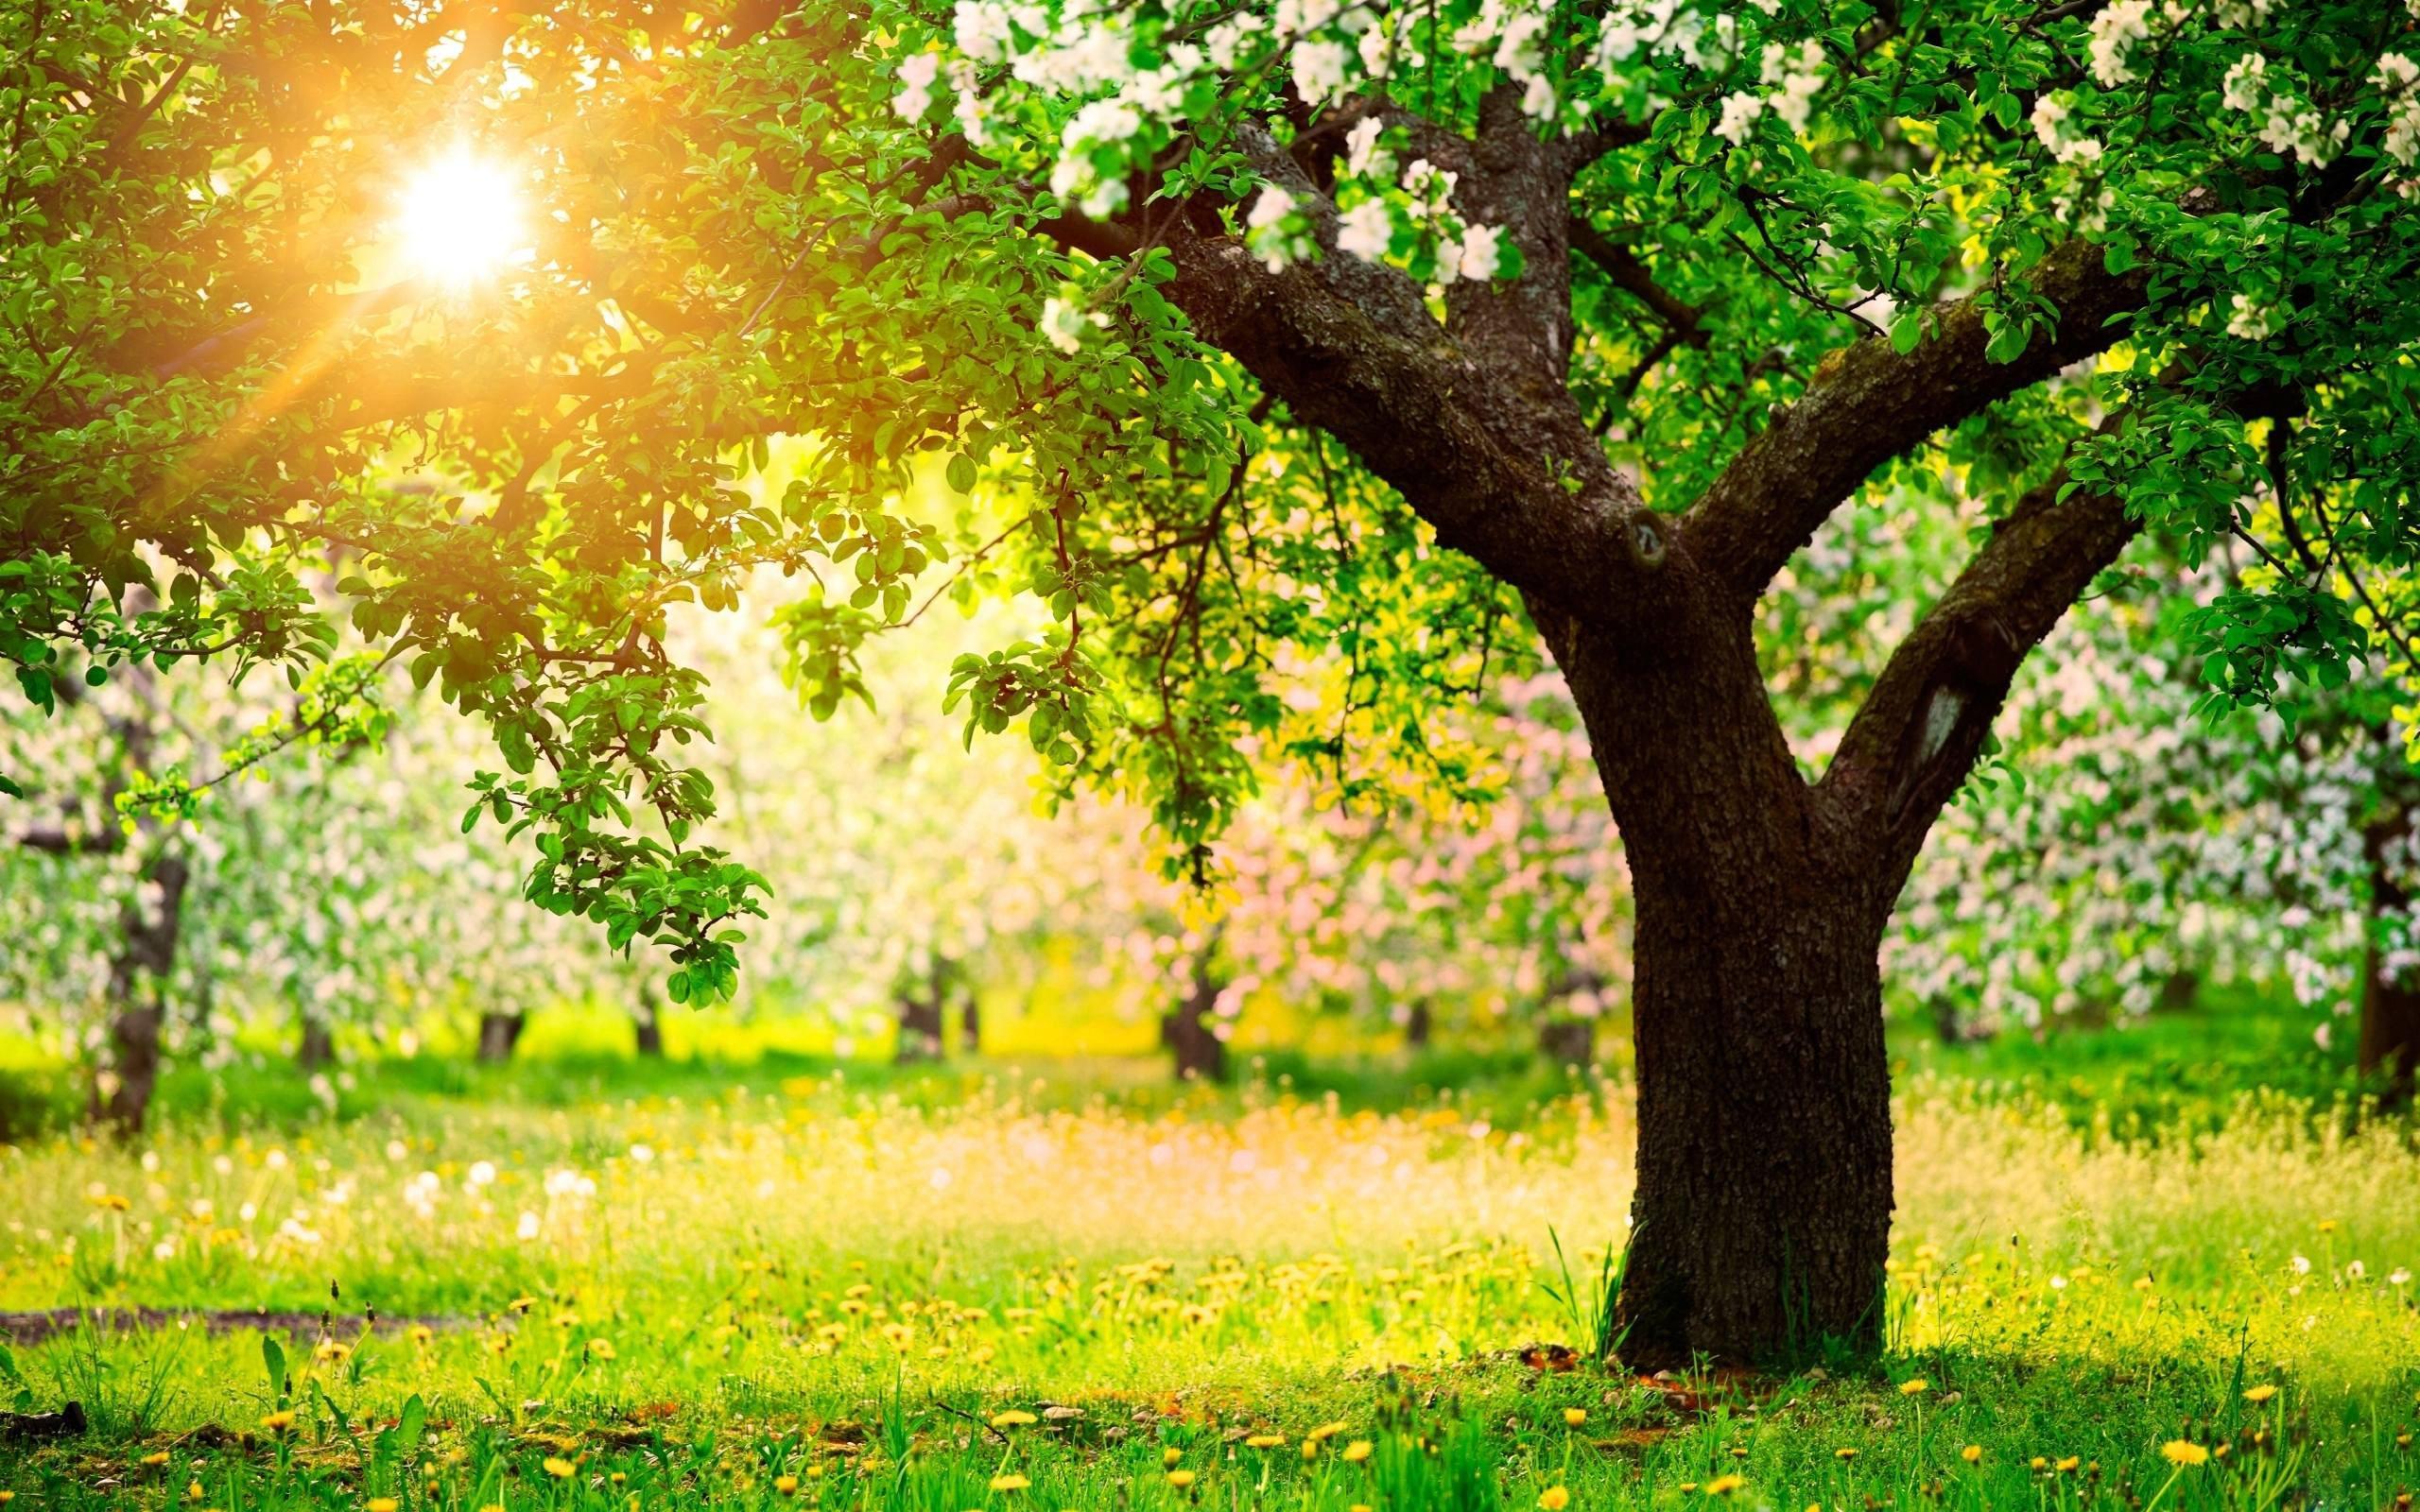 Beautiful Spring Nature Tree Desktop Wallpaper Image